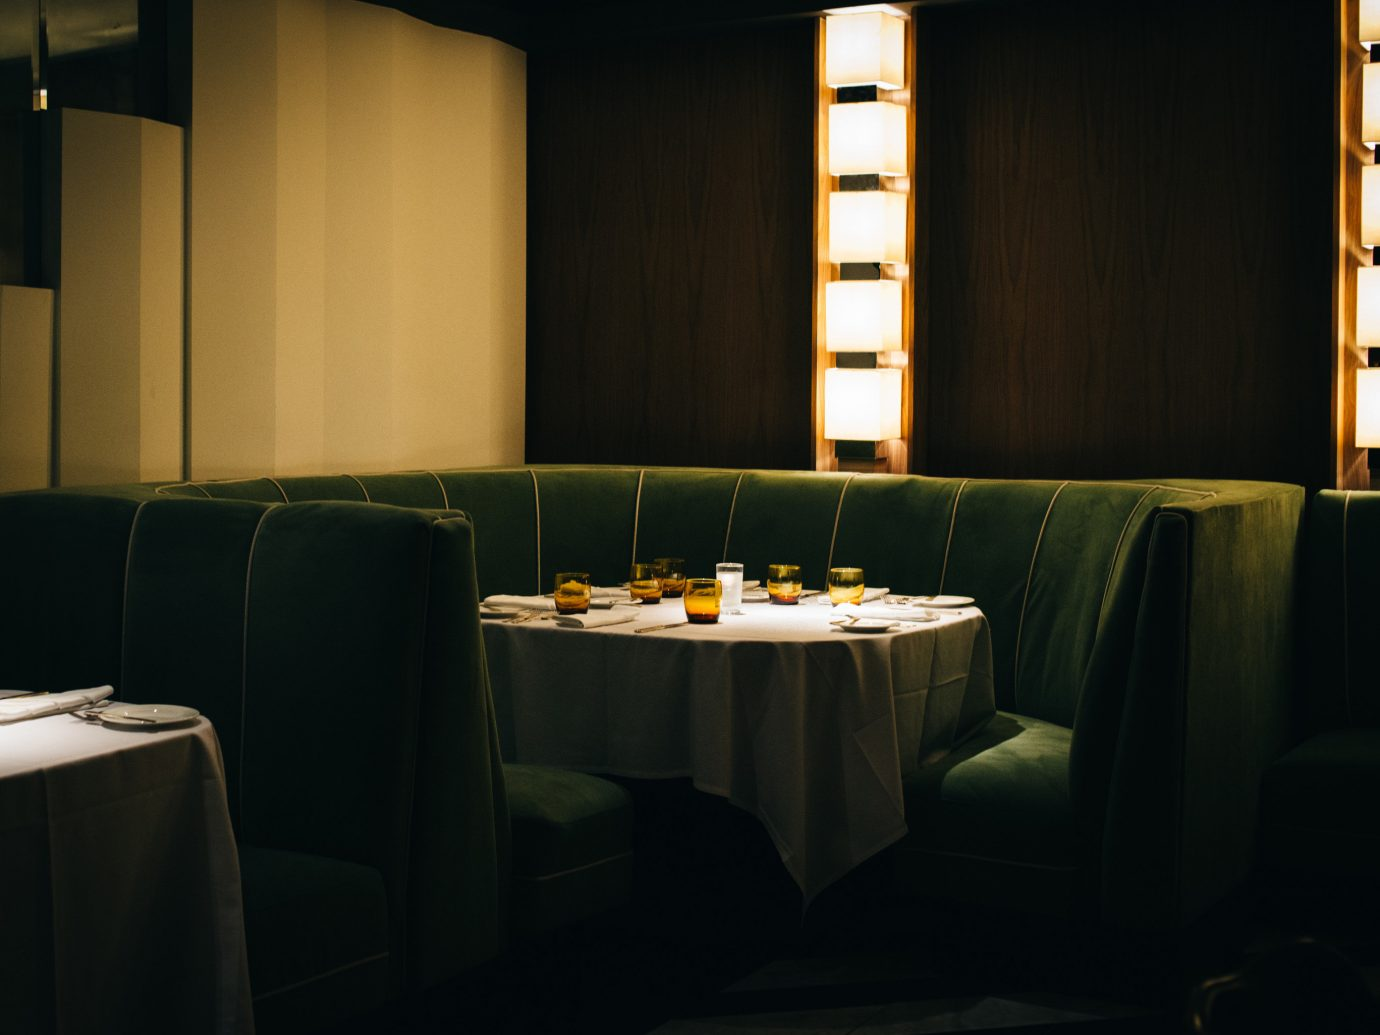 Jetsetter Guides wall indoor restaurant interior design lighting function hall Design meal lit conference hall